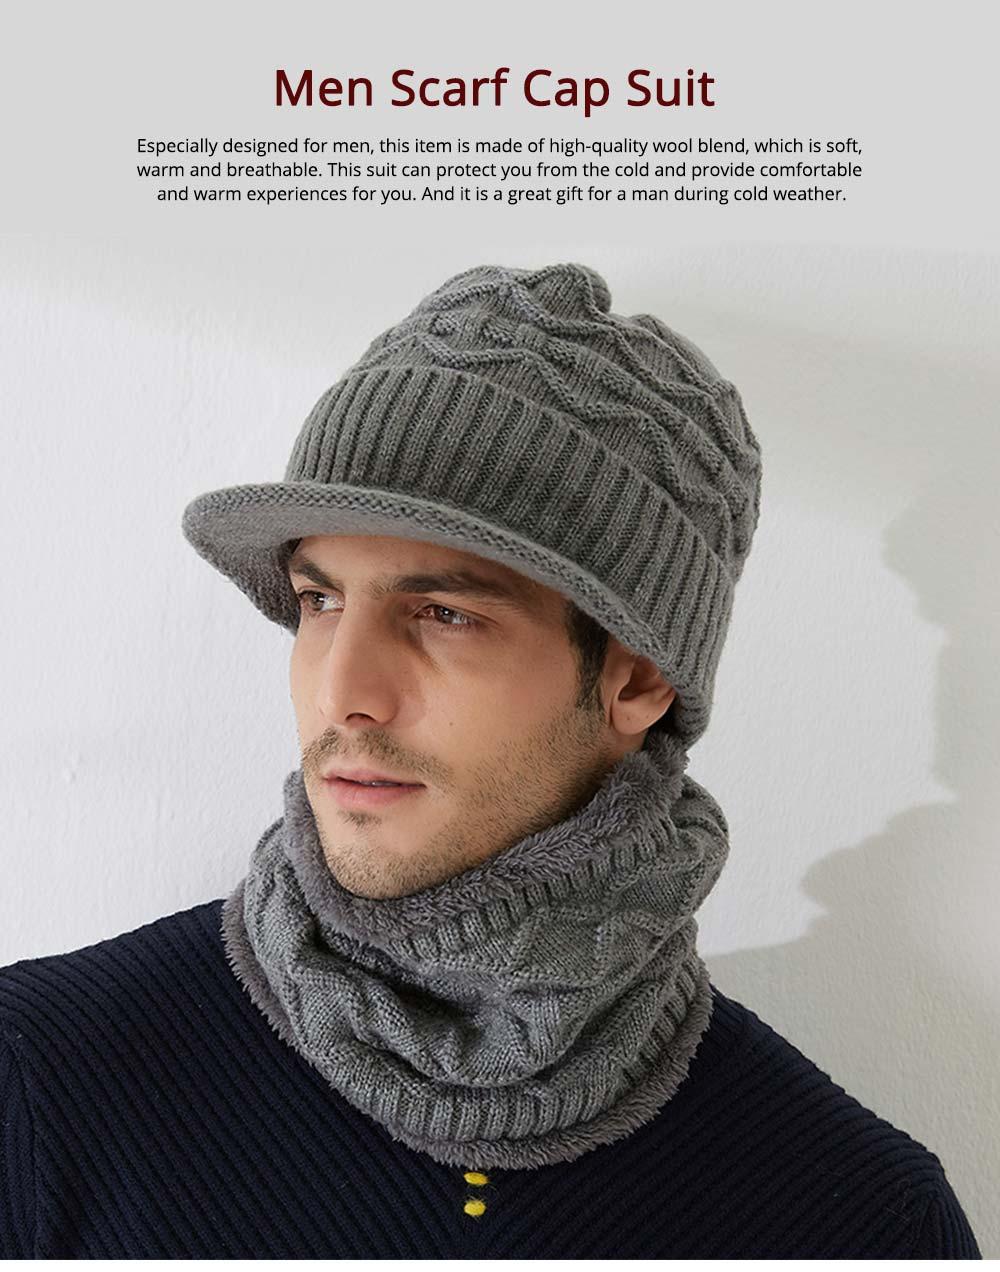 Cold Autumn Winter Men Outdoor Scarf Cap Suit f0ce611e1d9f